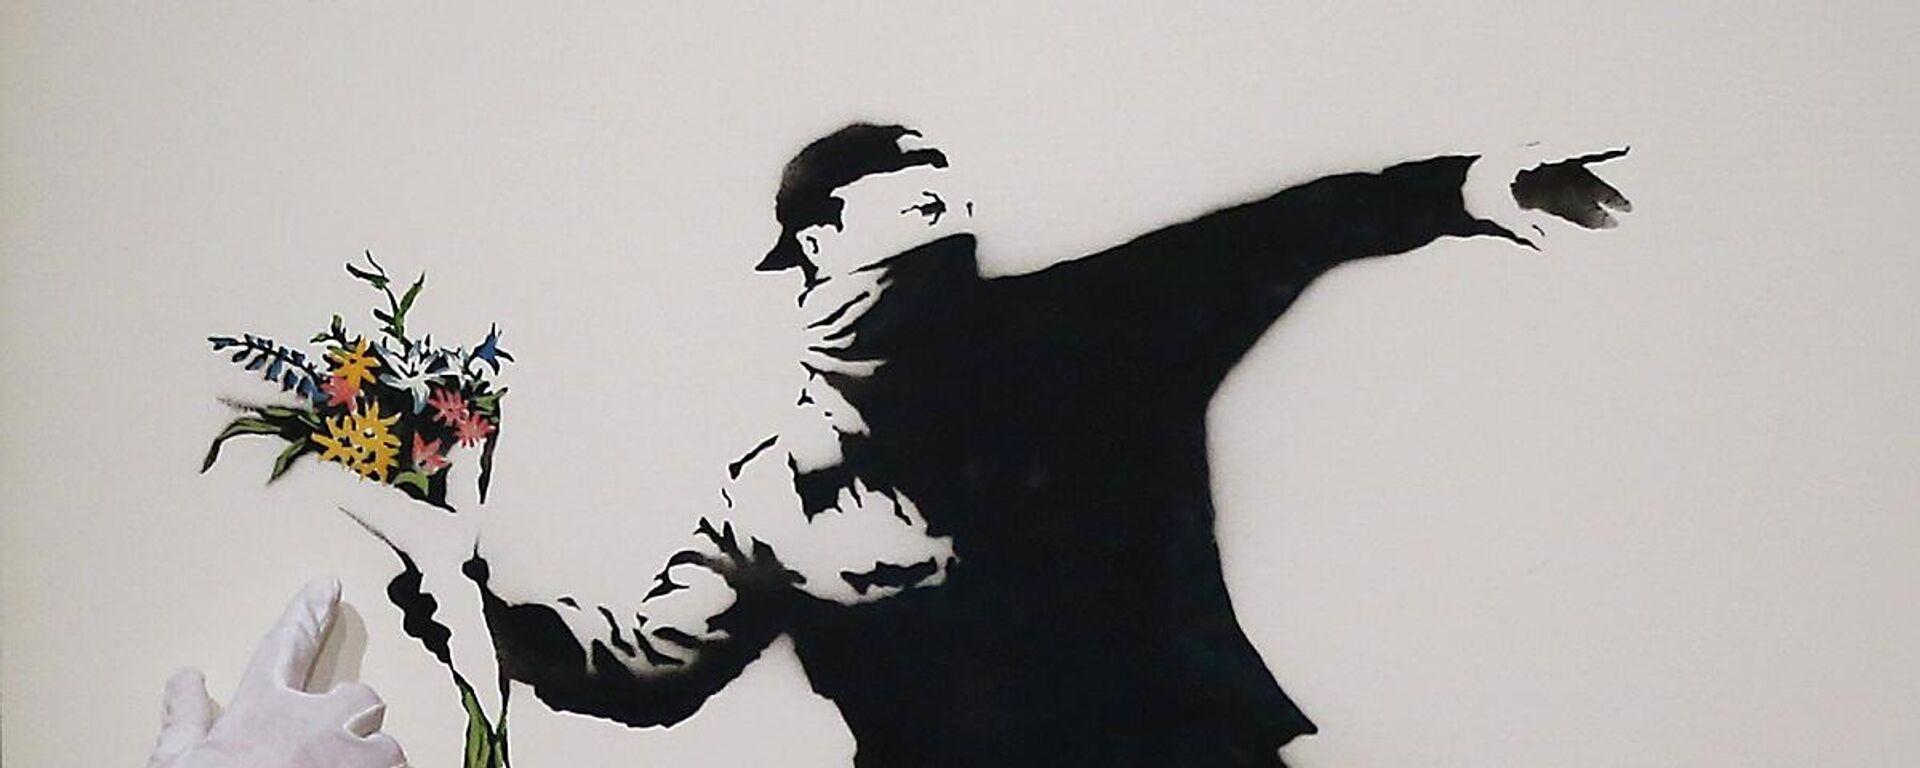 'Love is in the air', una obra del artista callejero Banksy  - Sputnik Mundo, 1920, 13.05.2021